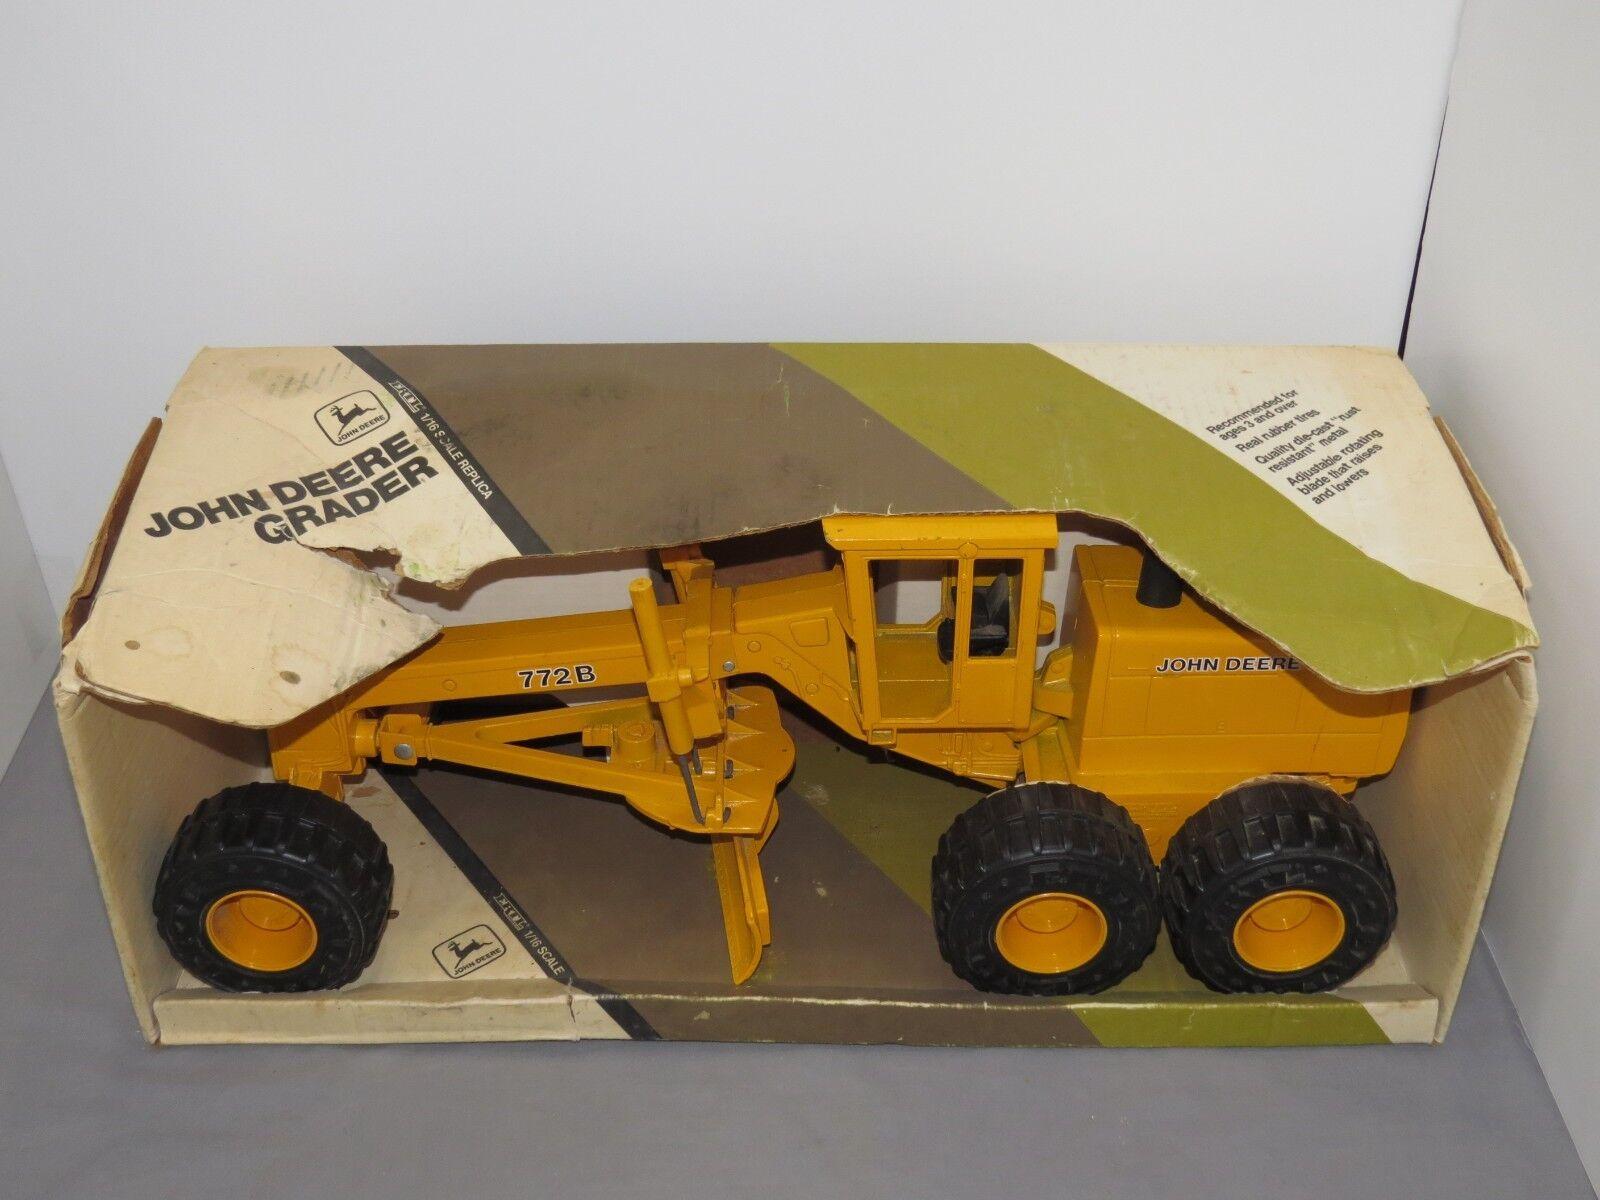 John Deere 772B Moteur Niveleuse 1 16 ERTL Toy  511 die cast métal JD New in Box énorme